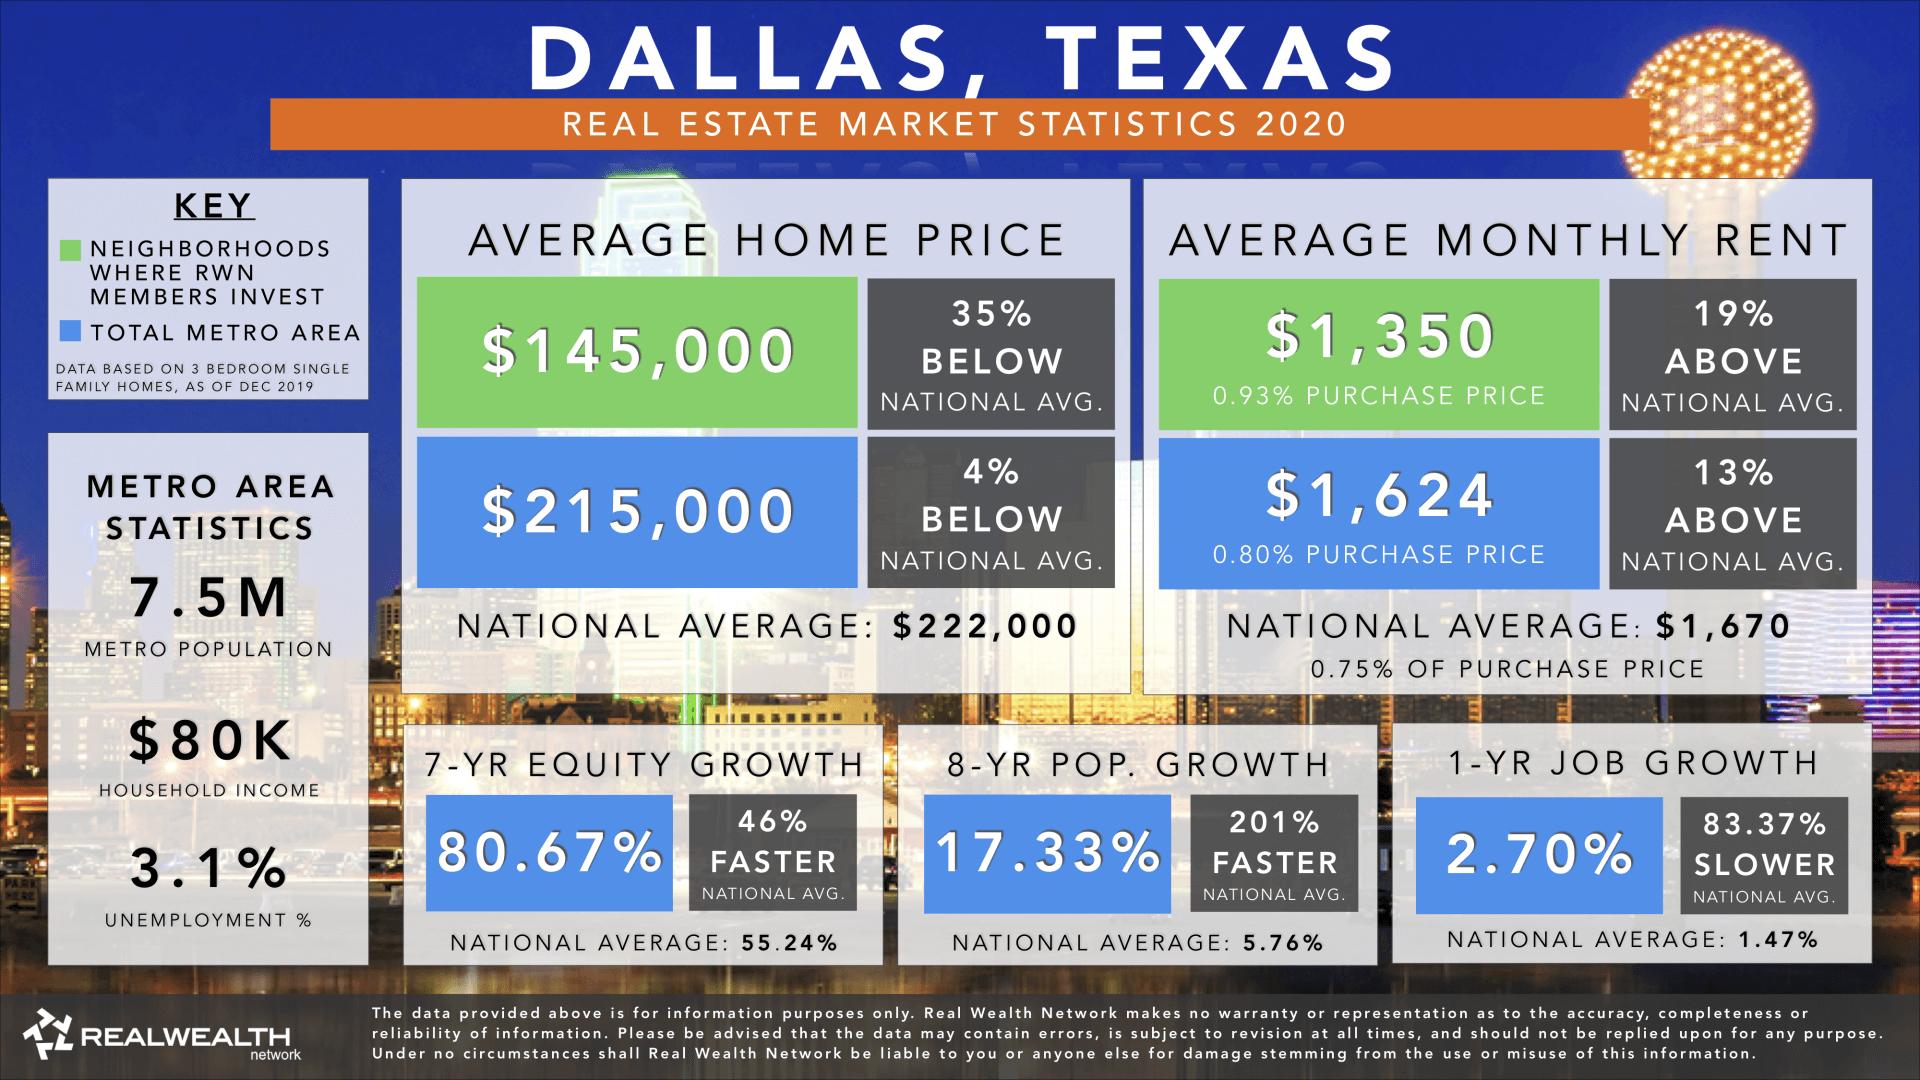 Dallas Real Estate Market Trends & Statistics 2020